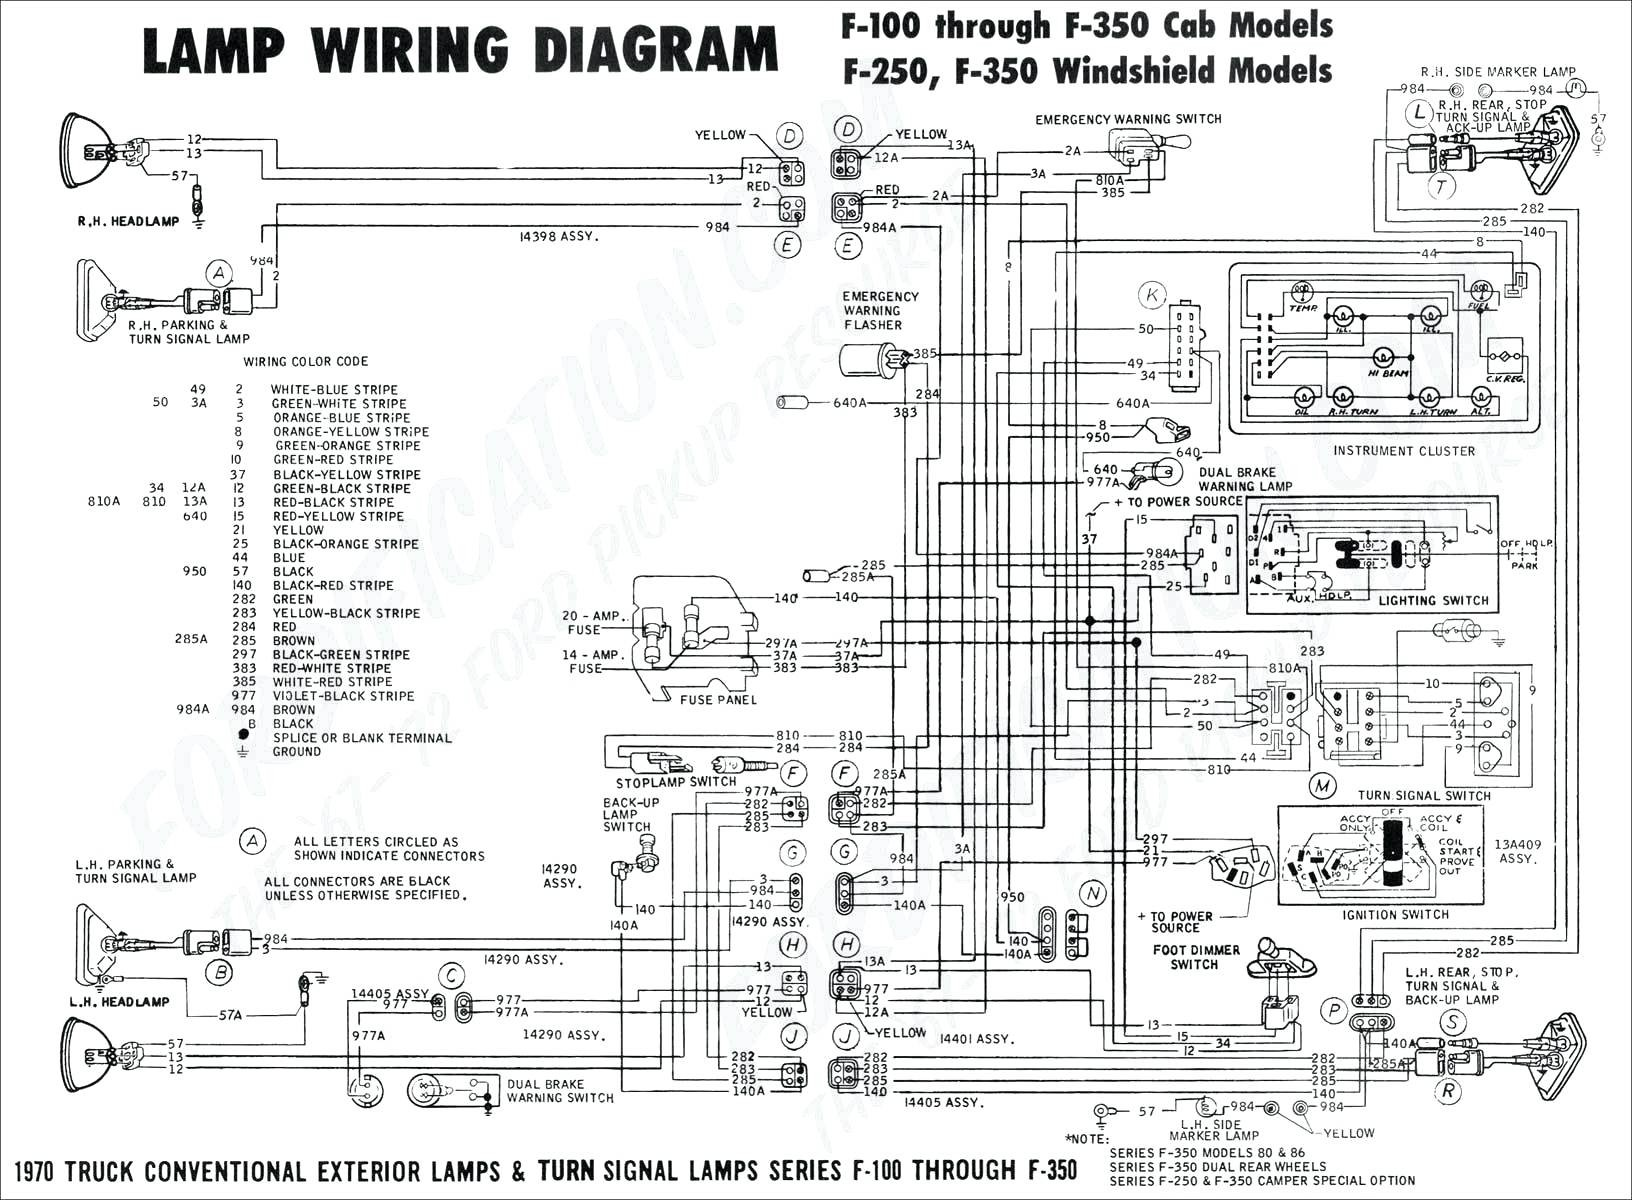 68 Camaro Engine Wiring Diagram 2000 Camaro Headlight Wiring Diagram Wire Center • Of 68 Camaro Engine Wiring Diagram 1967 Camaro Alternator Wiring Harness Free Download Electrical